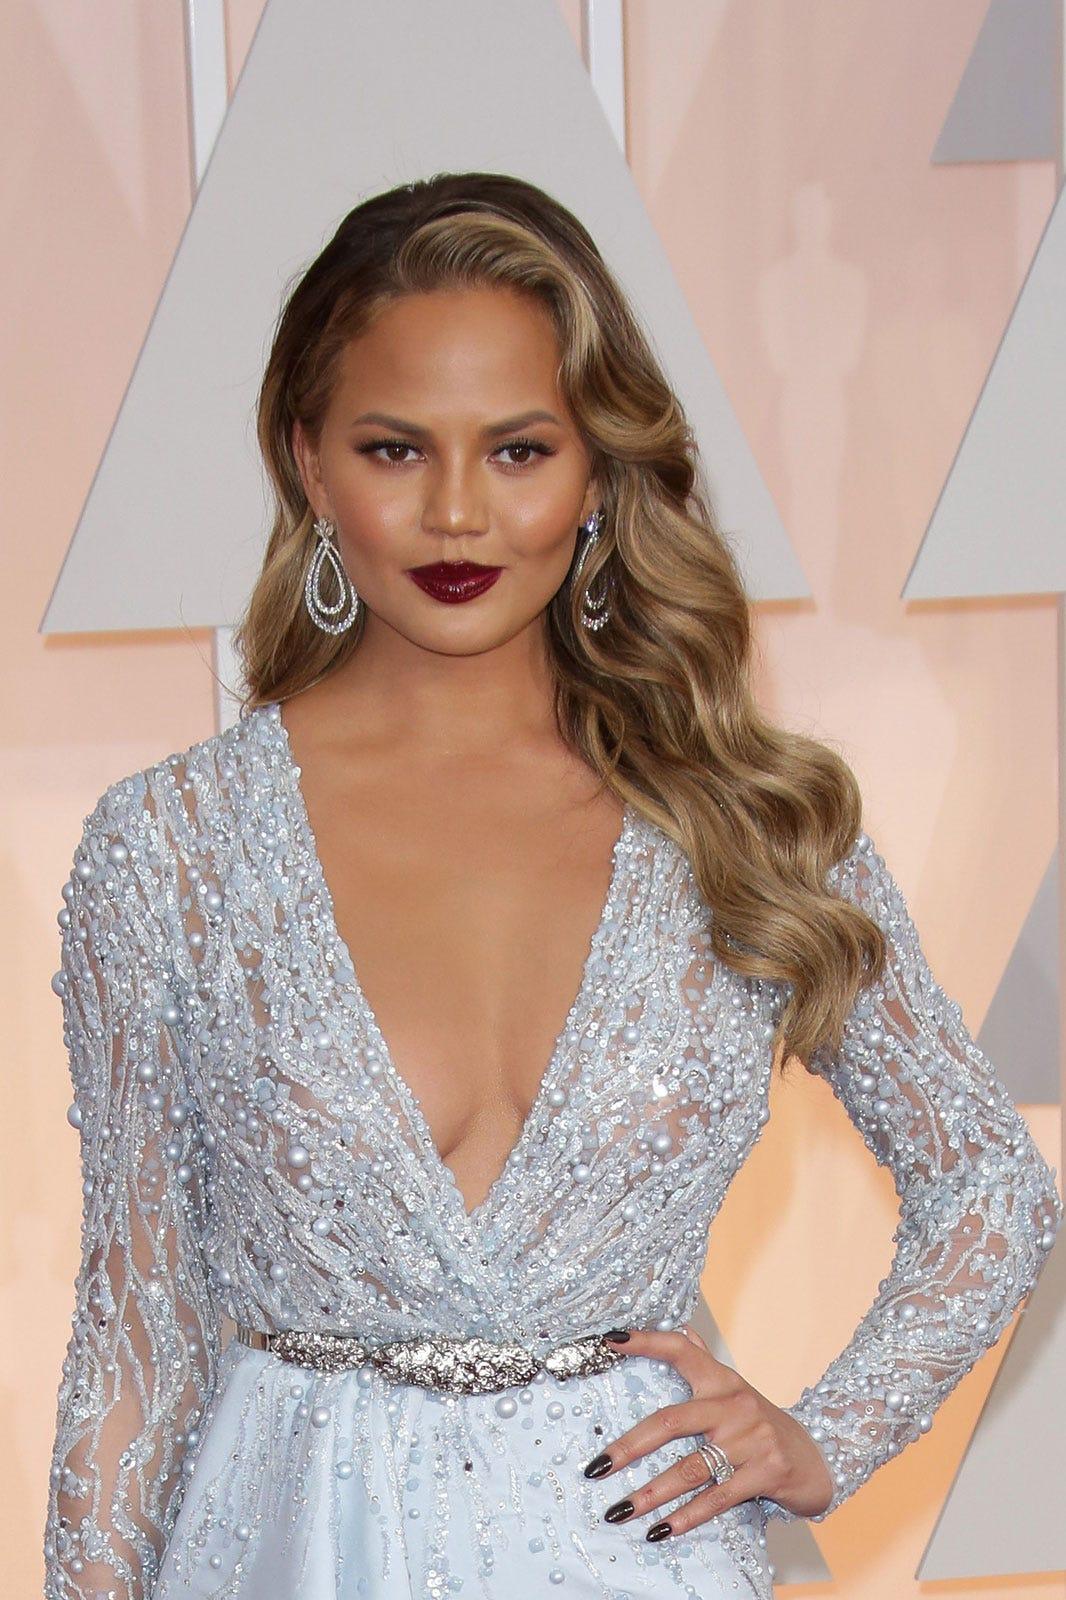 Best Makeup Looks 2015 Academy Awards